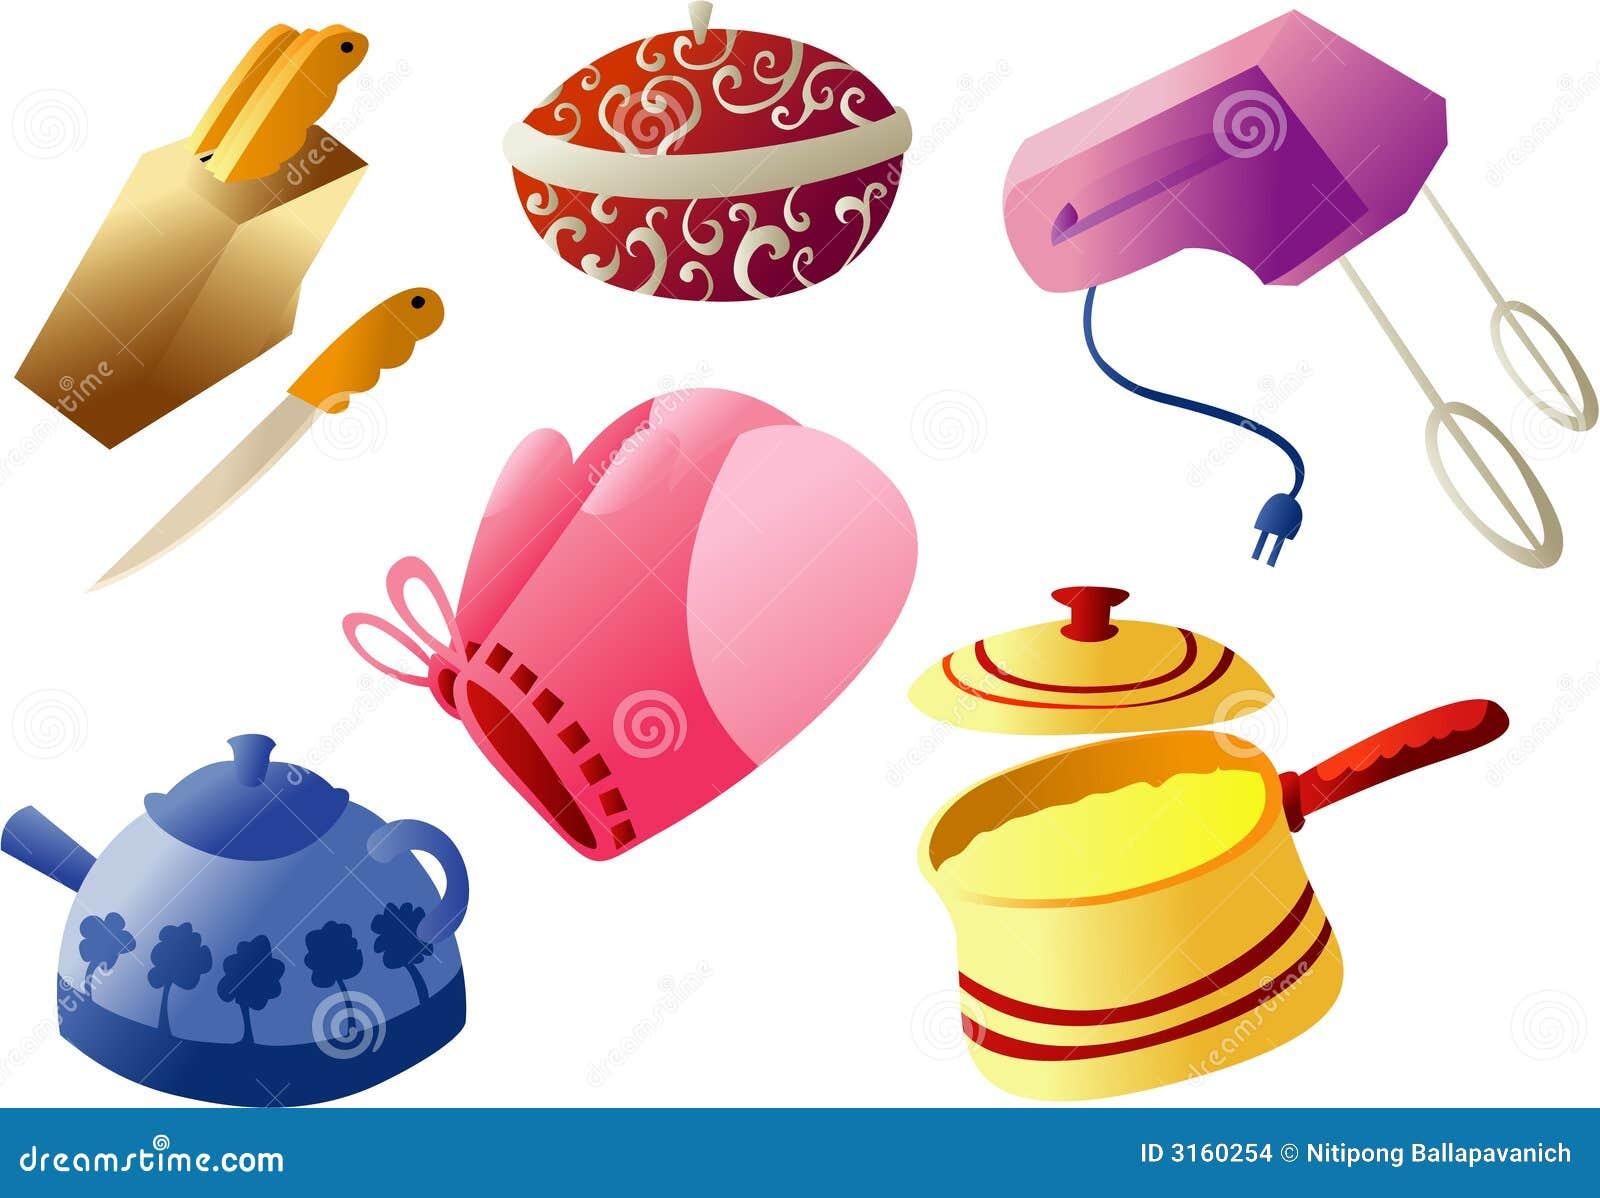 Kitchenware Cliparts Stock Vector Illustration Of Equipment 3160254